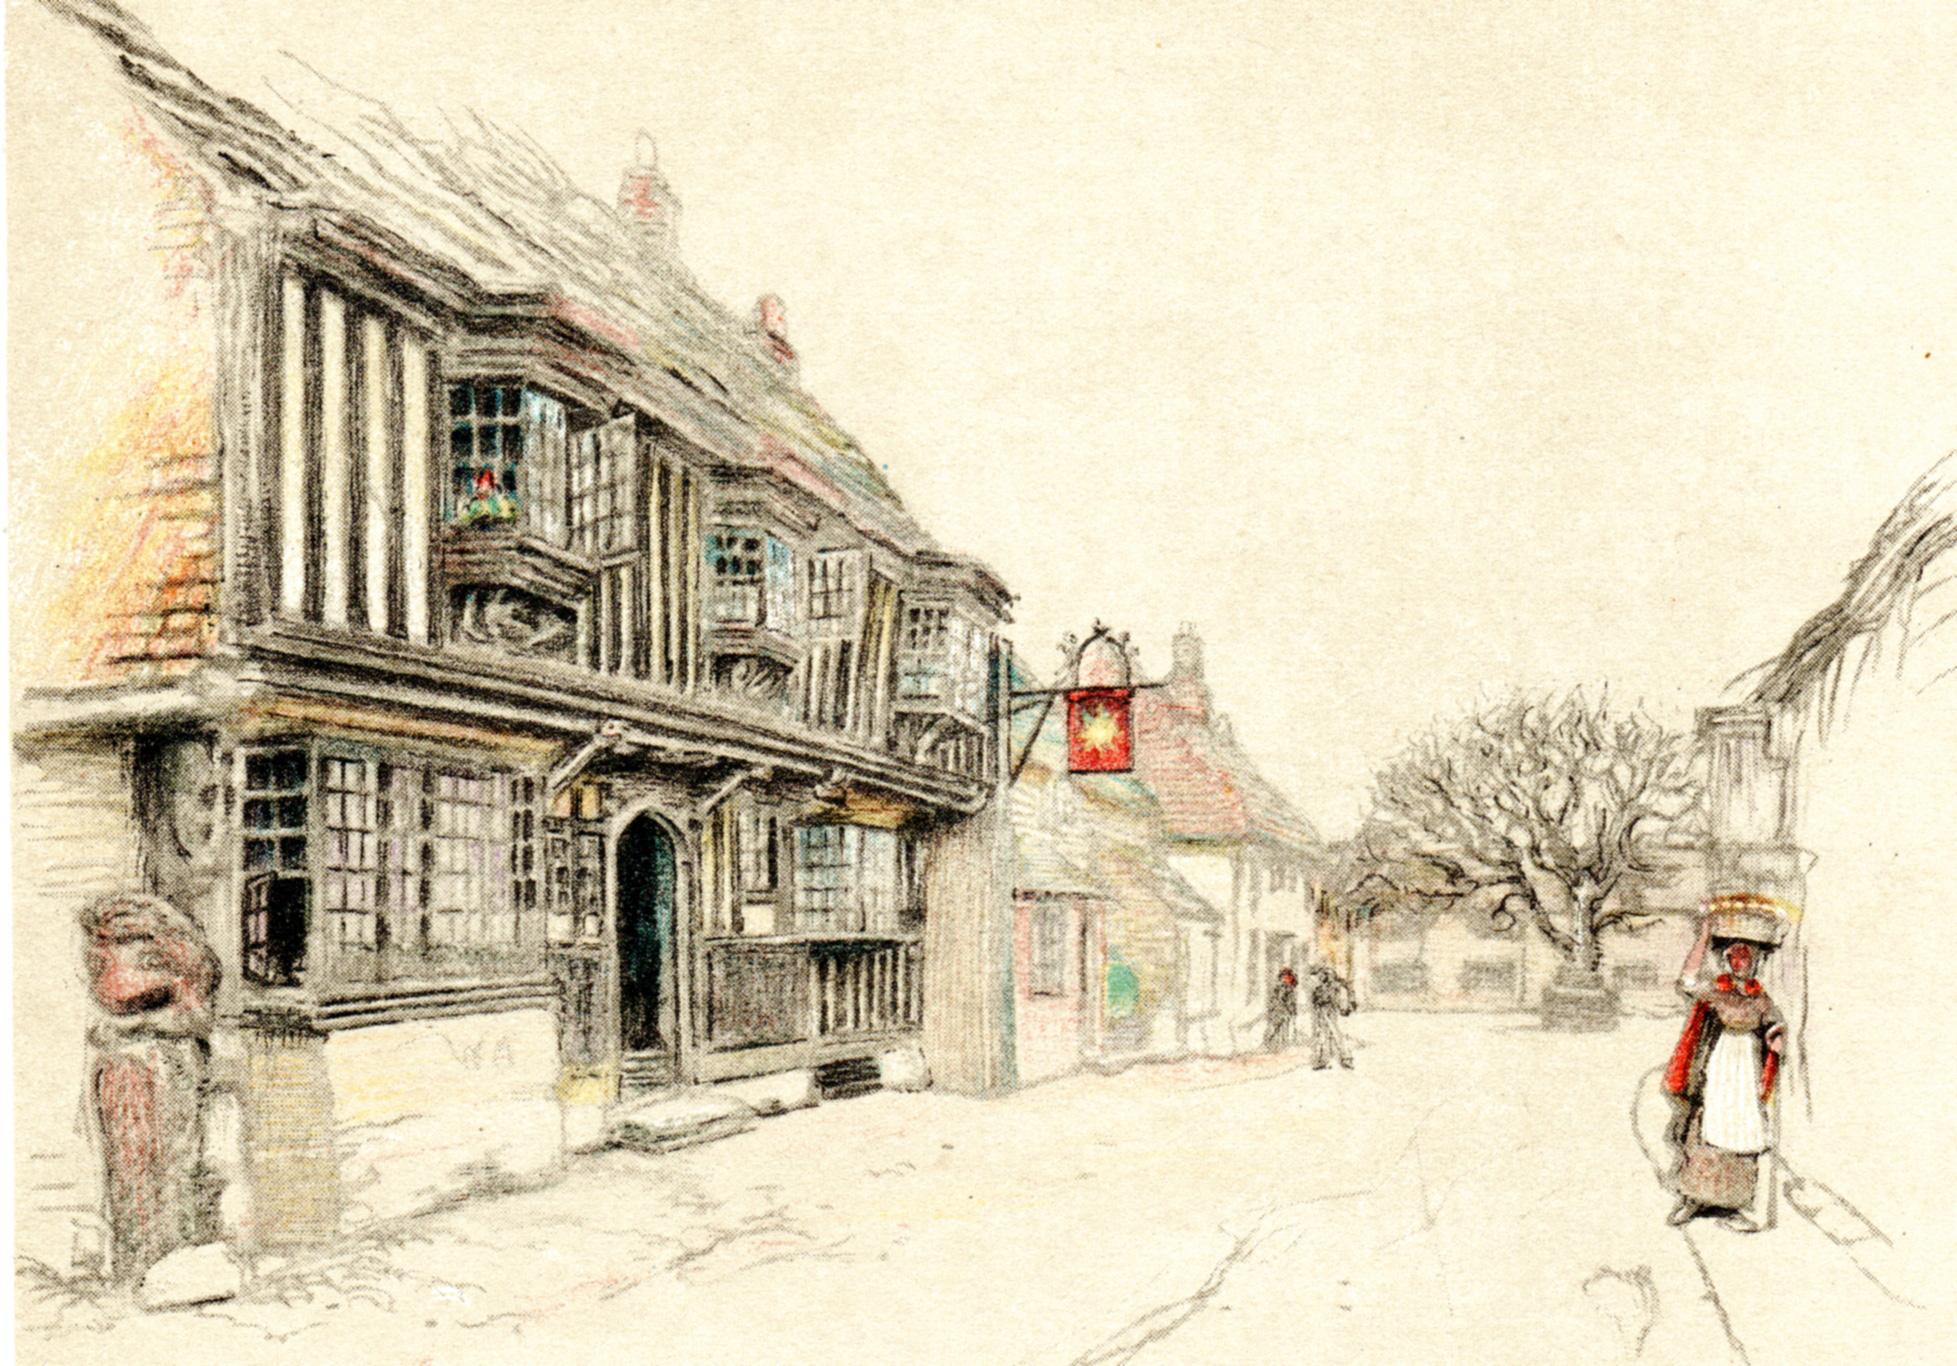 Aldin, Cecil – Old Inns